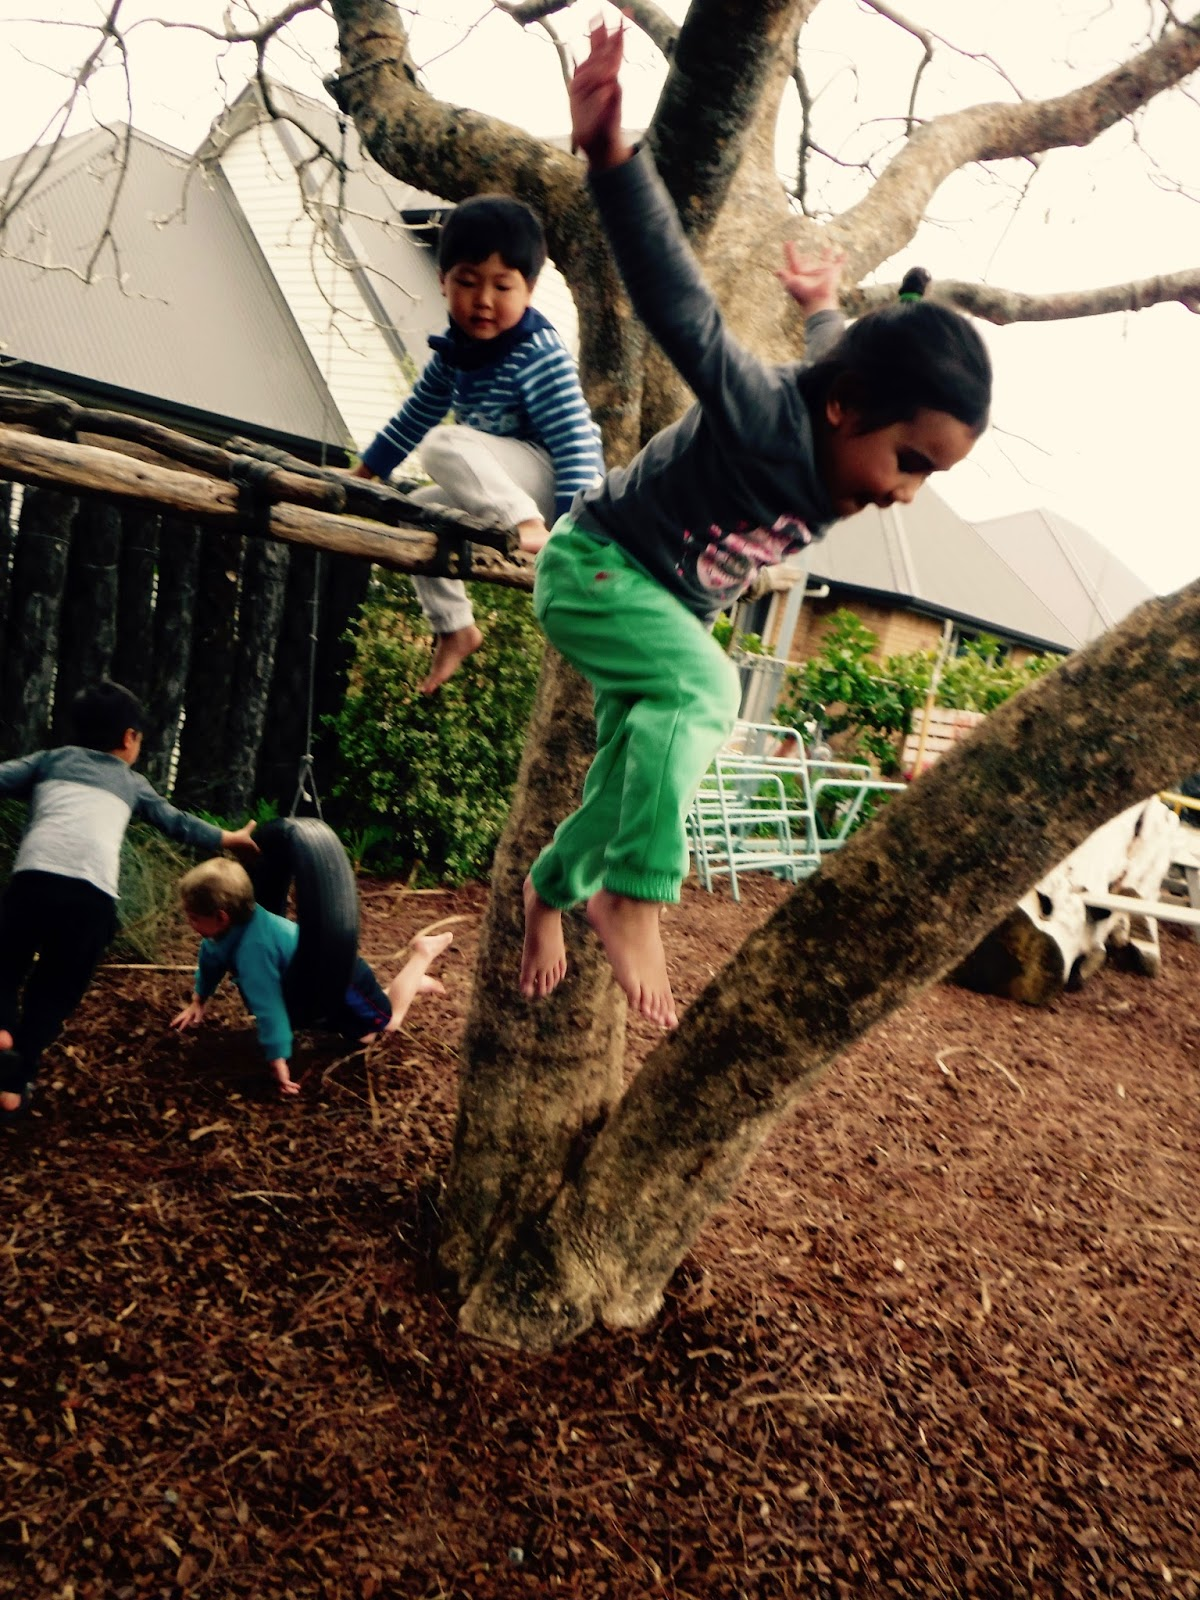 Play At American Girl: Mairtown Kindergarten: Risky Play